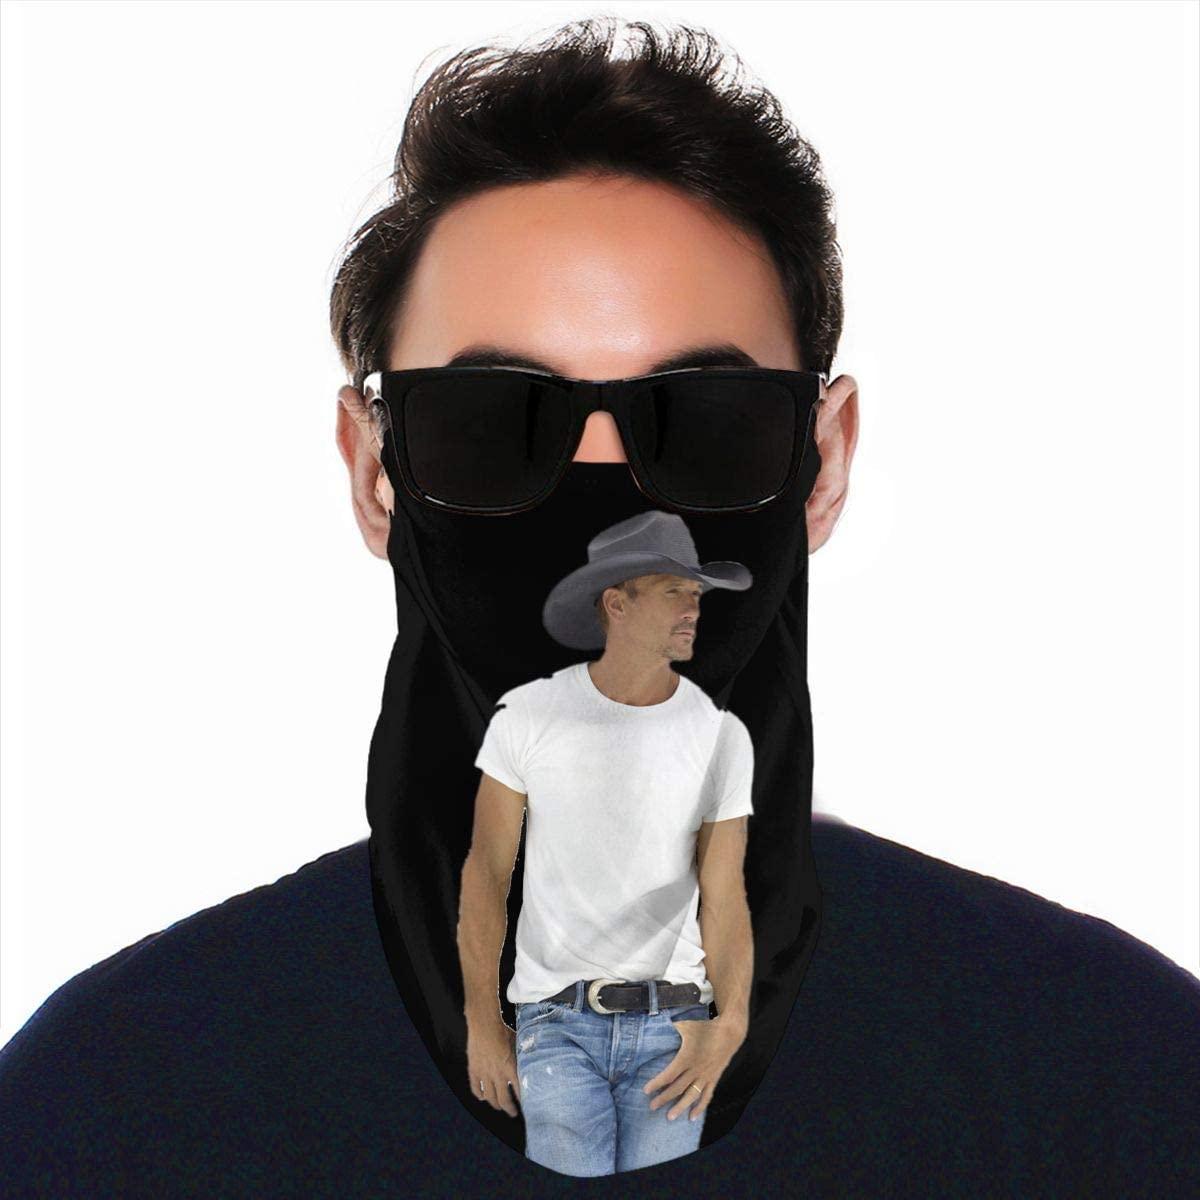 StephaSport Tim McGraw Fashion Windproof Warm Scarf Soft Men Women Scarfs Outdoor